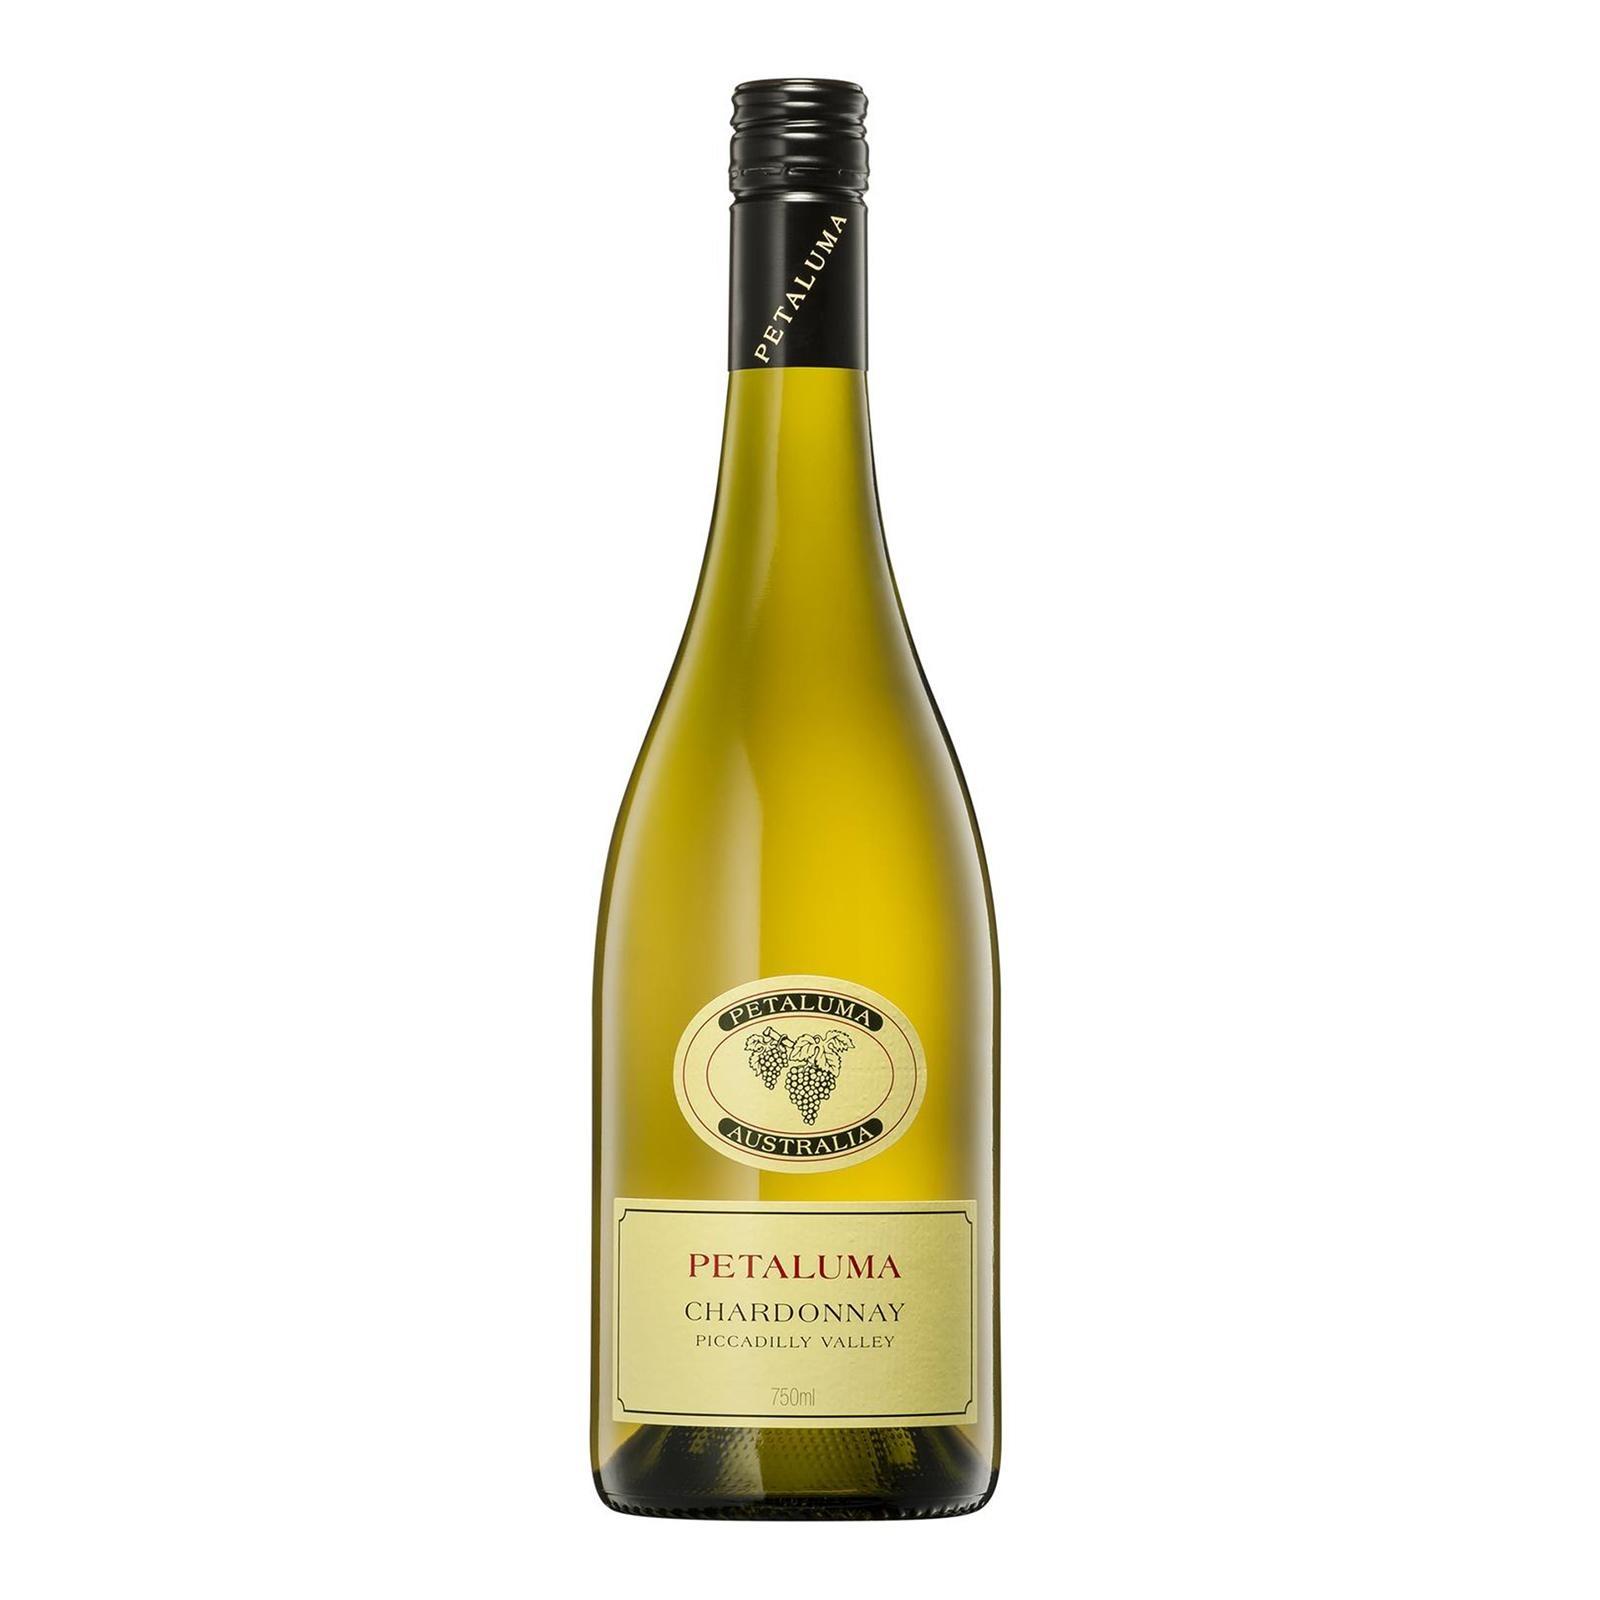 Petaluma Piccadilly Valley Chardonnay-By Culina